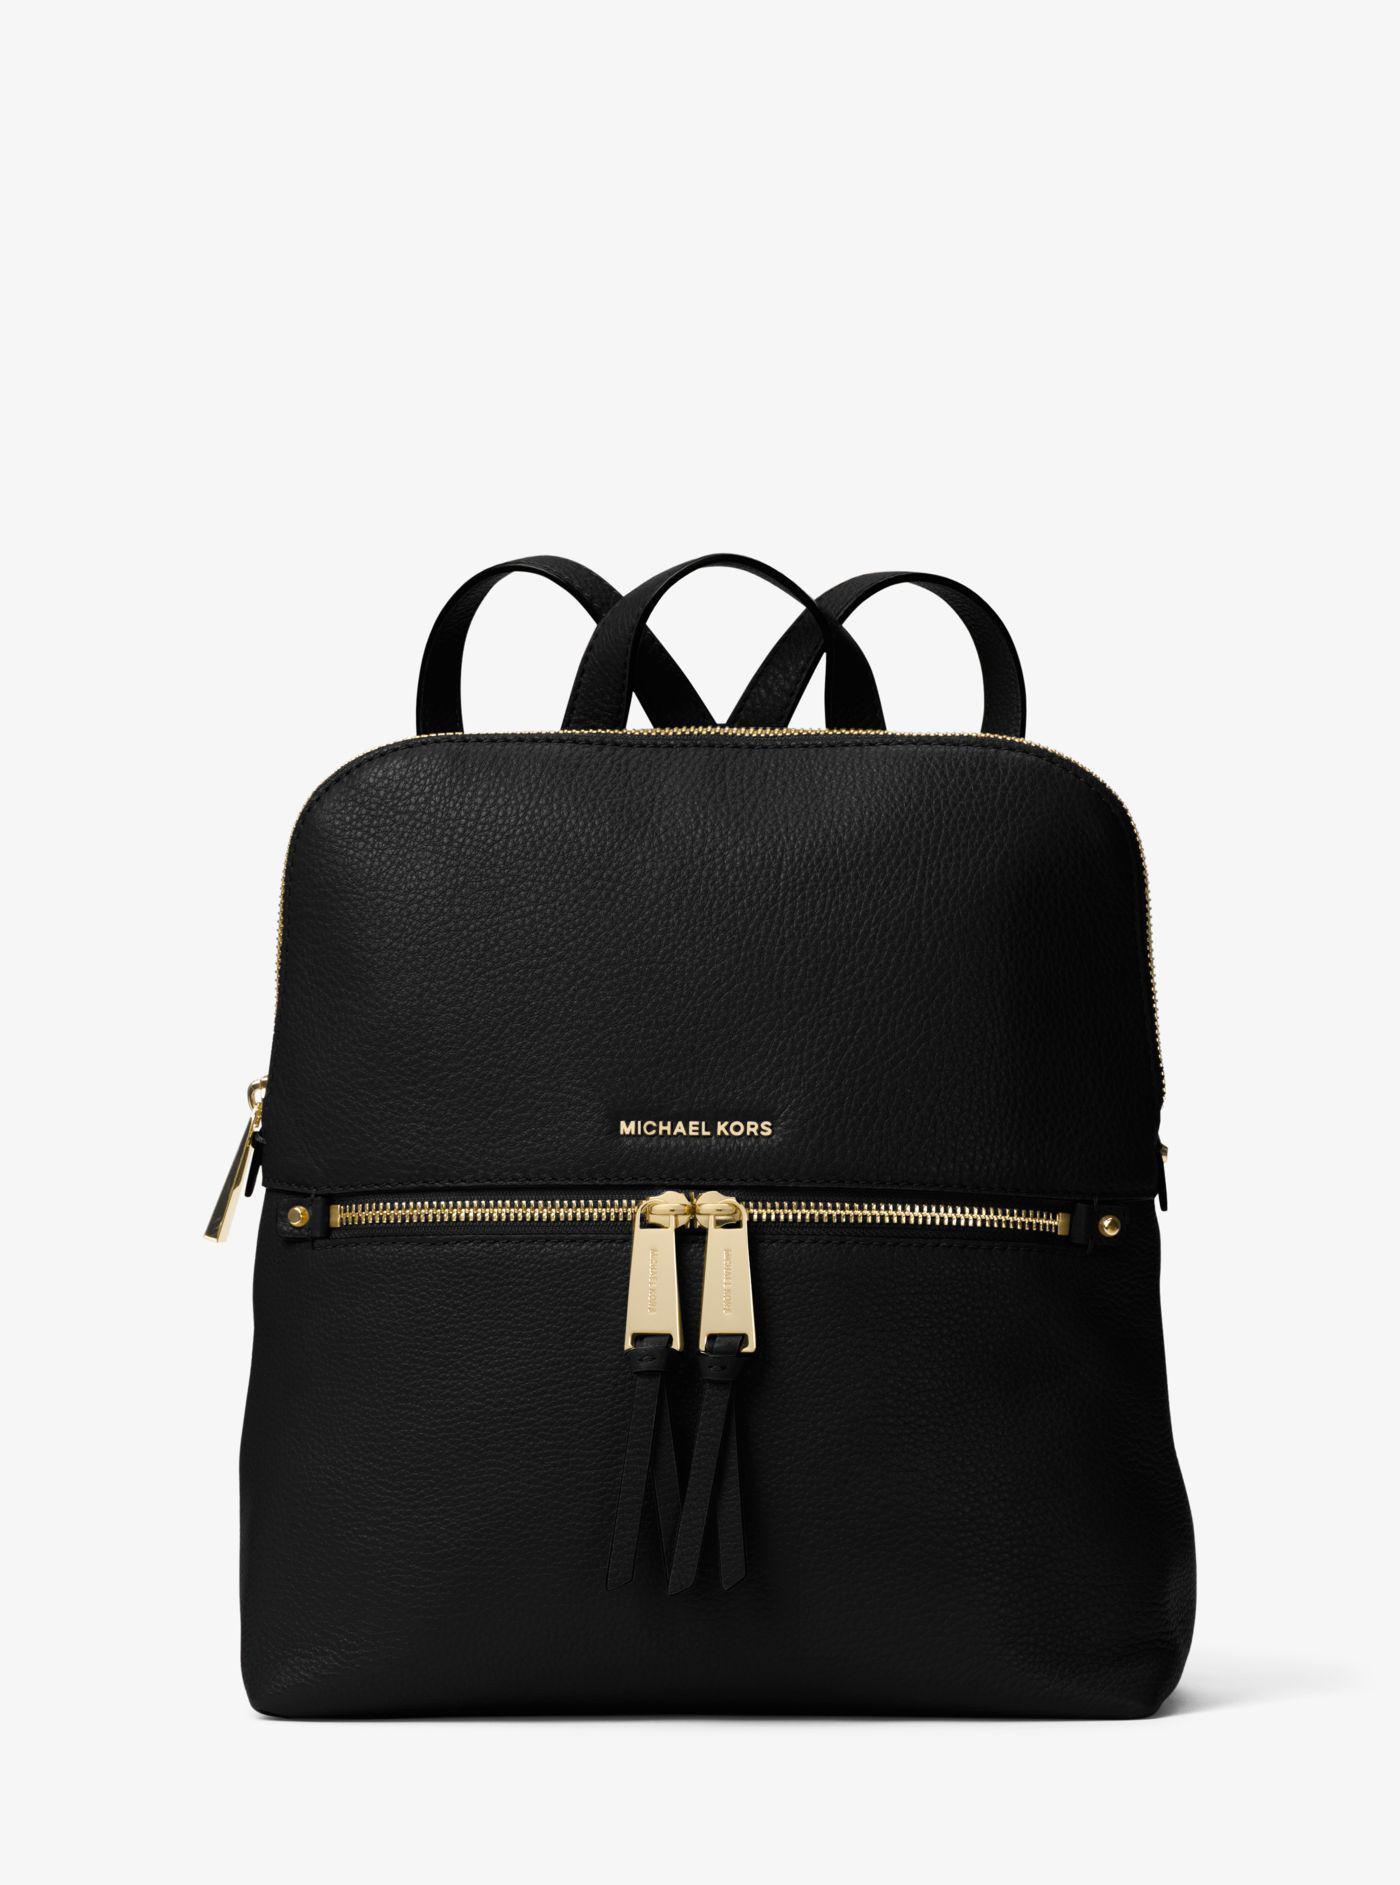 85815e7e999c Michael Kors - Black Rhea Medium Slim Leather Backpack - Lyst. View  fullscreen